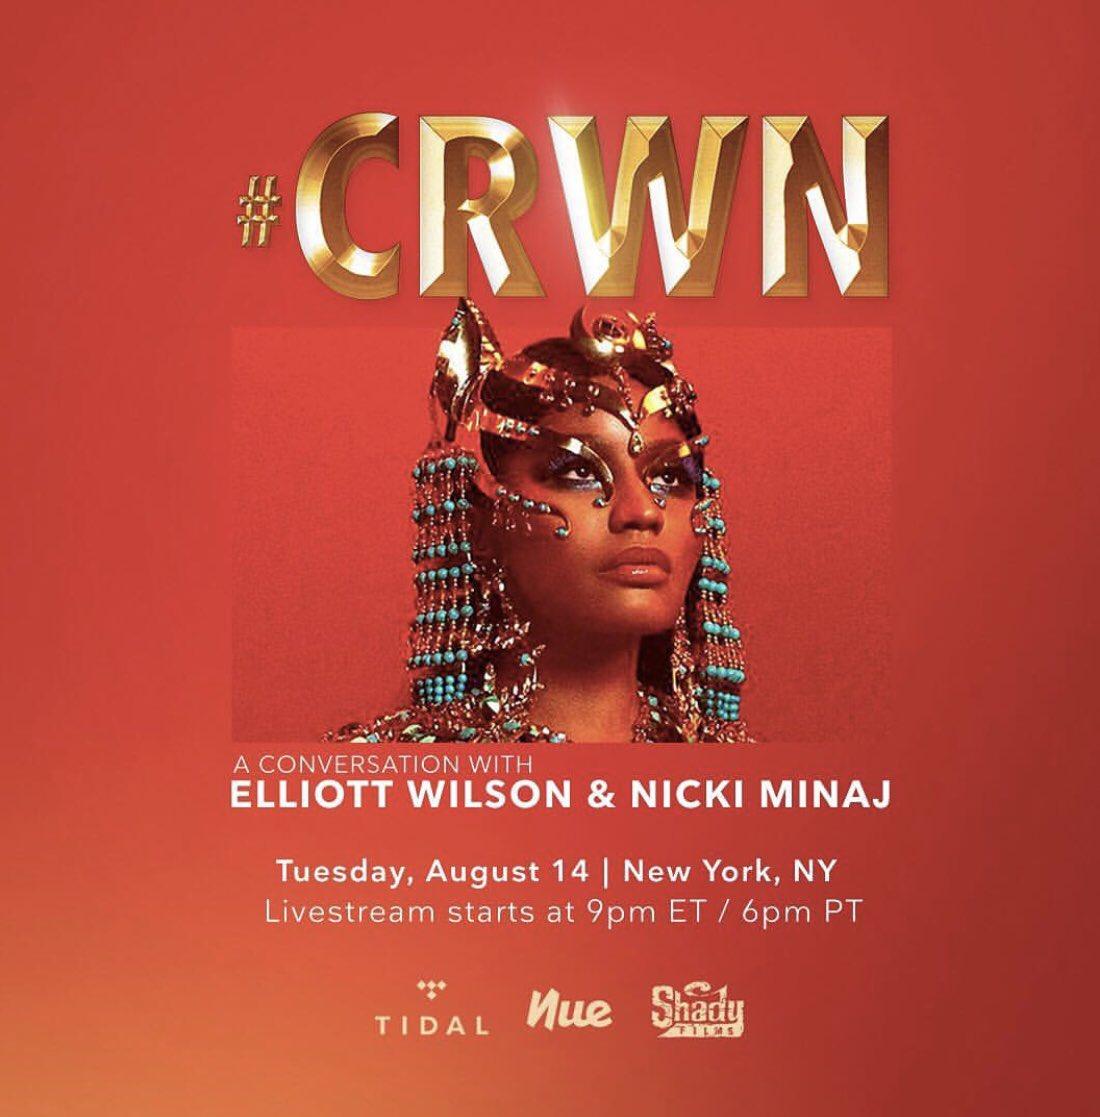 You can live steam @ 9pm EST TONIGHT!!!! @TIDAL @ElliottWilson #CrwnXNickiMinaj https://t.co/iL9PeAbxsn